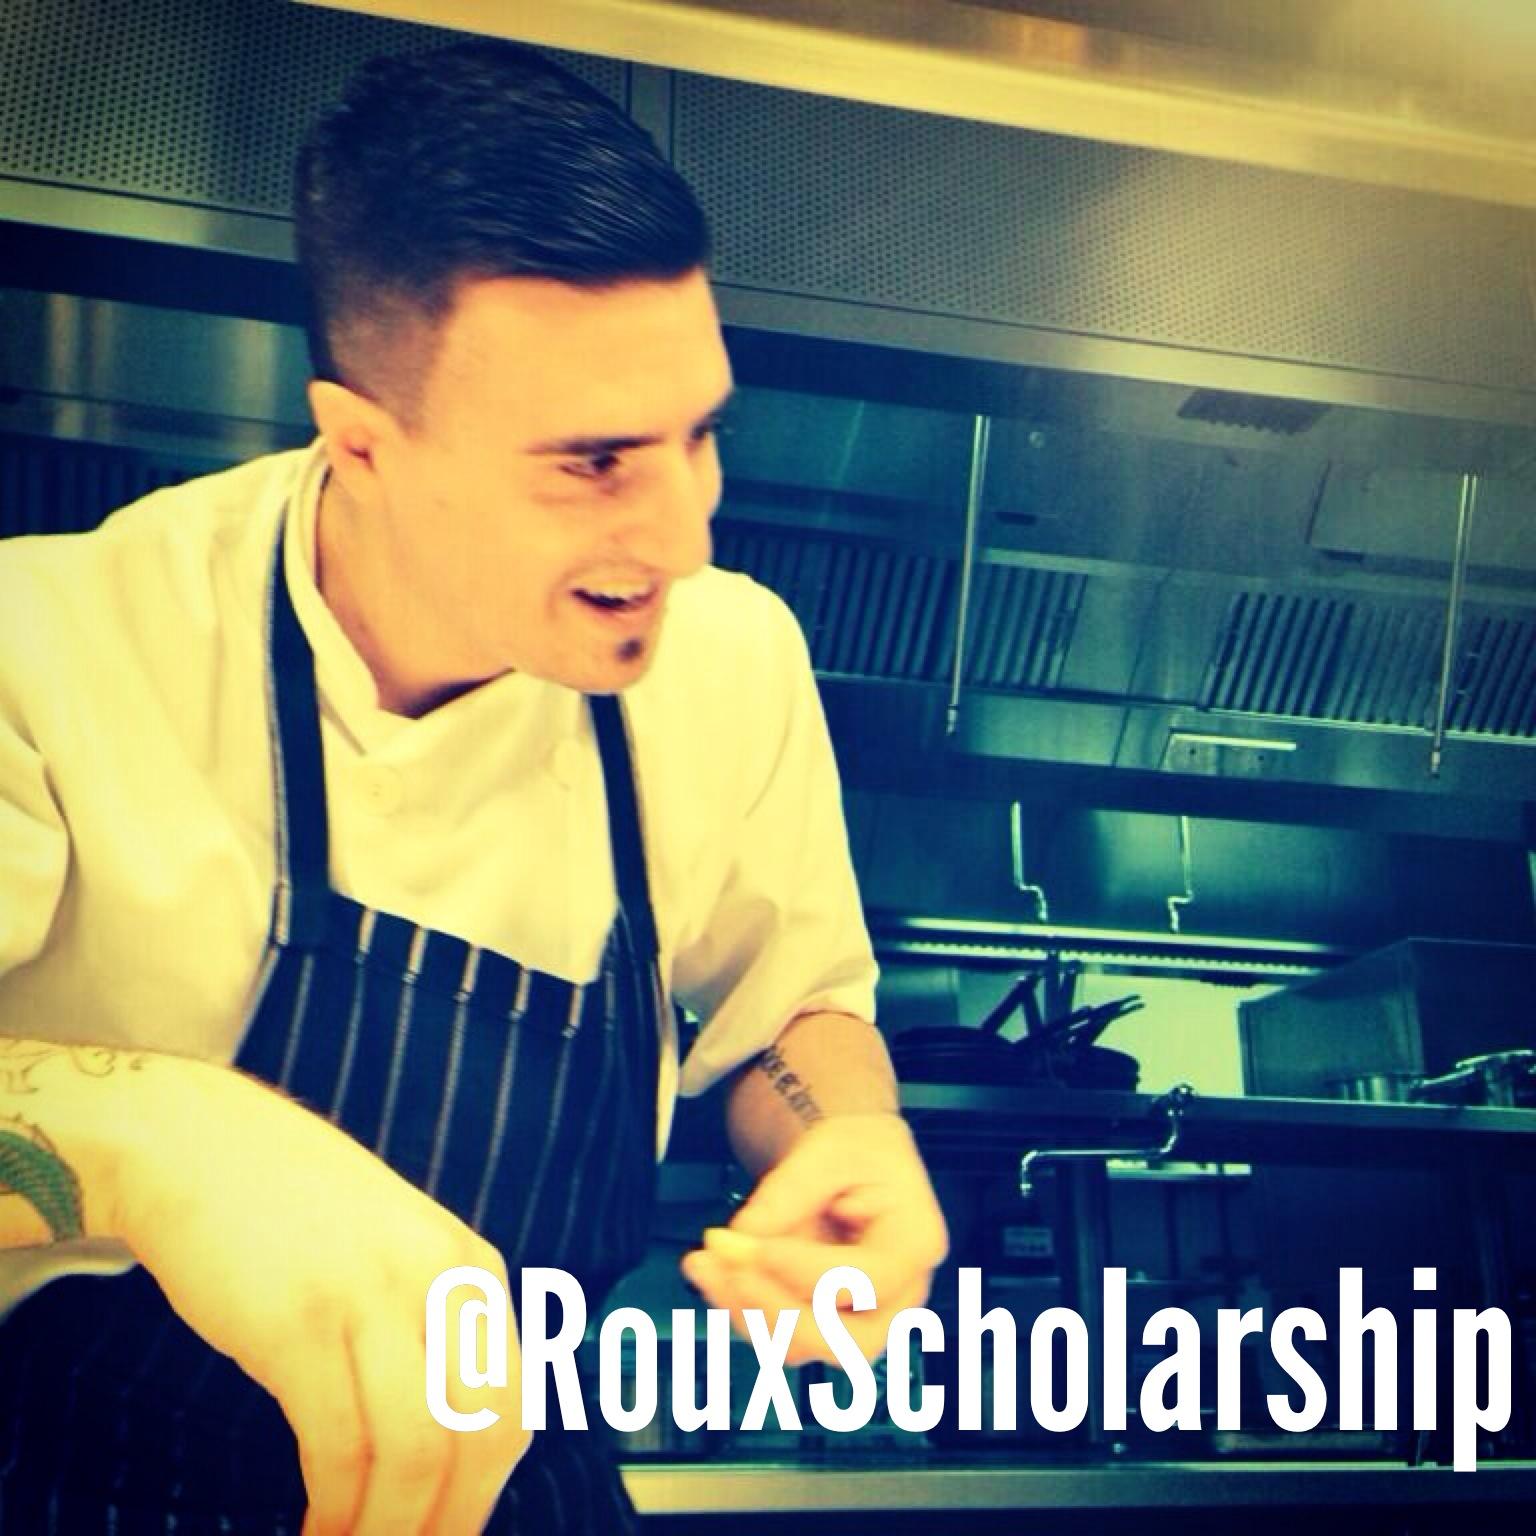 Roux Scholarship